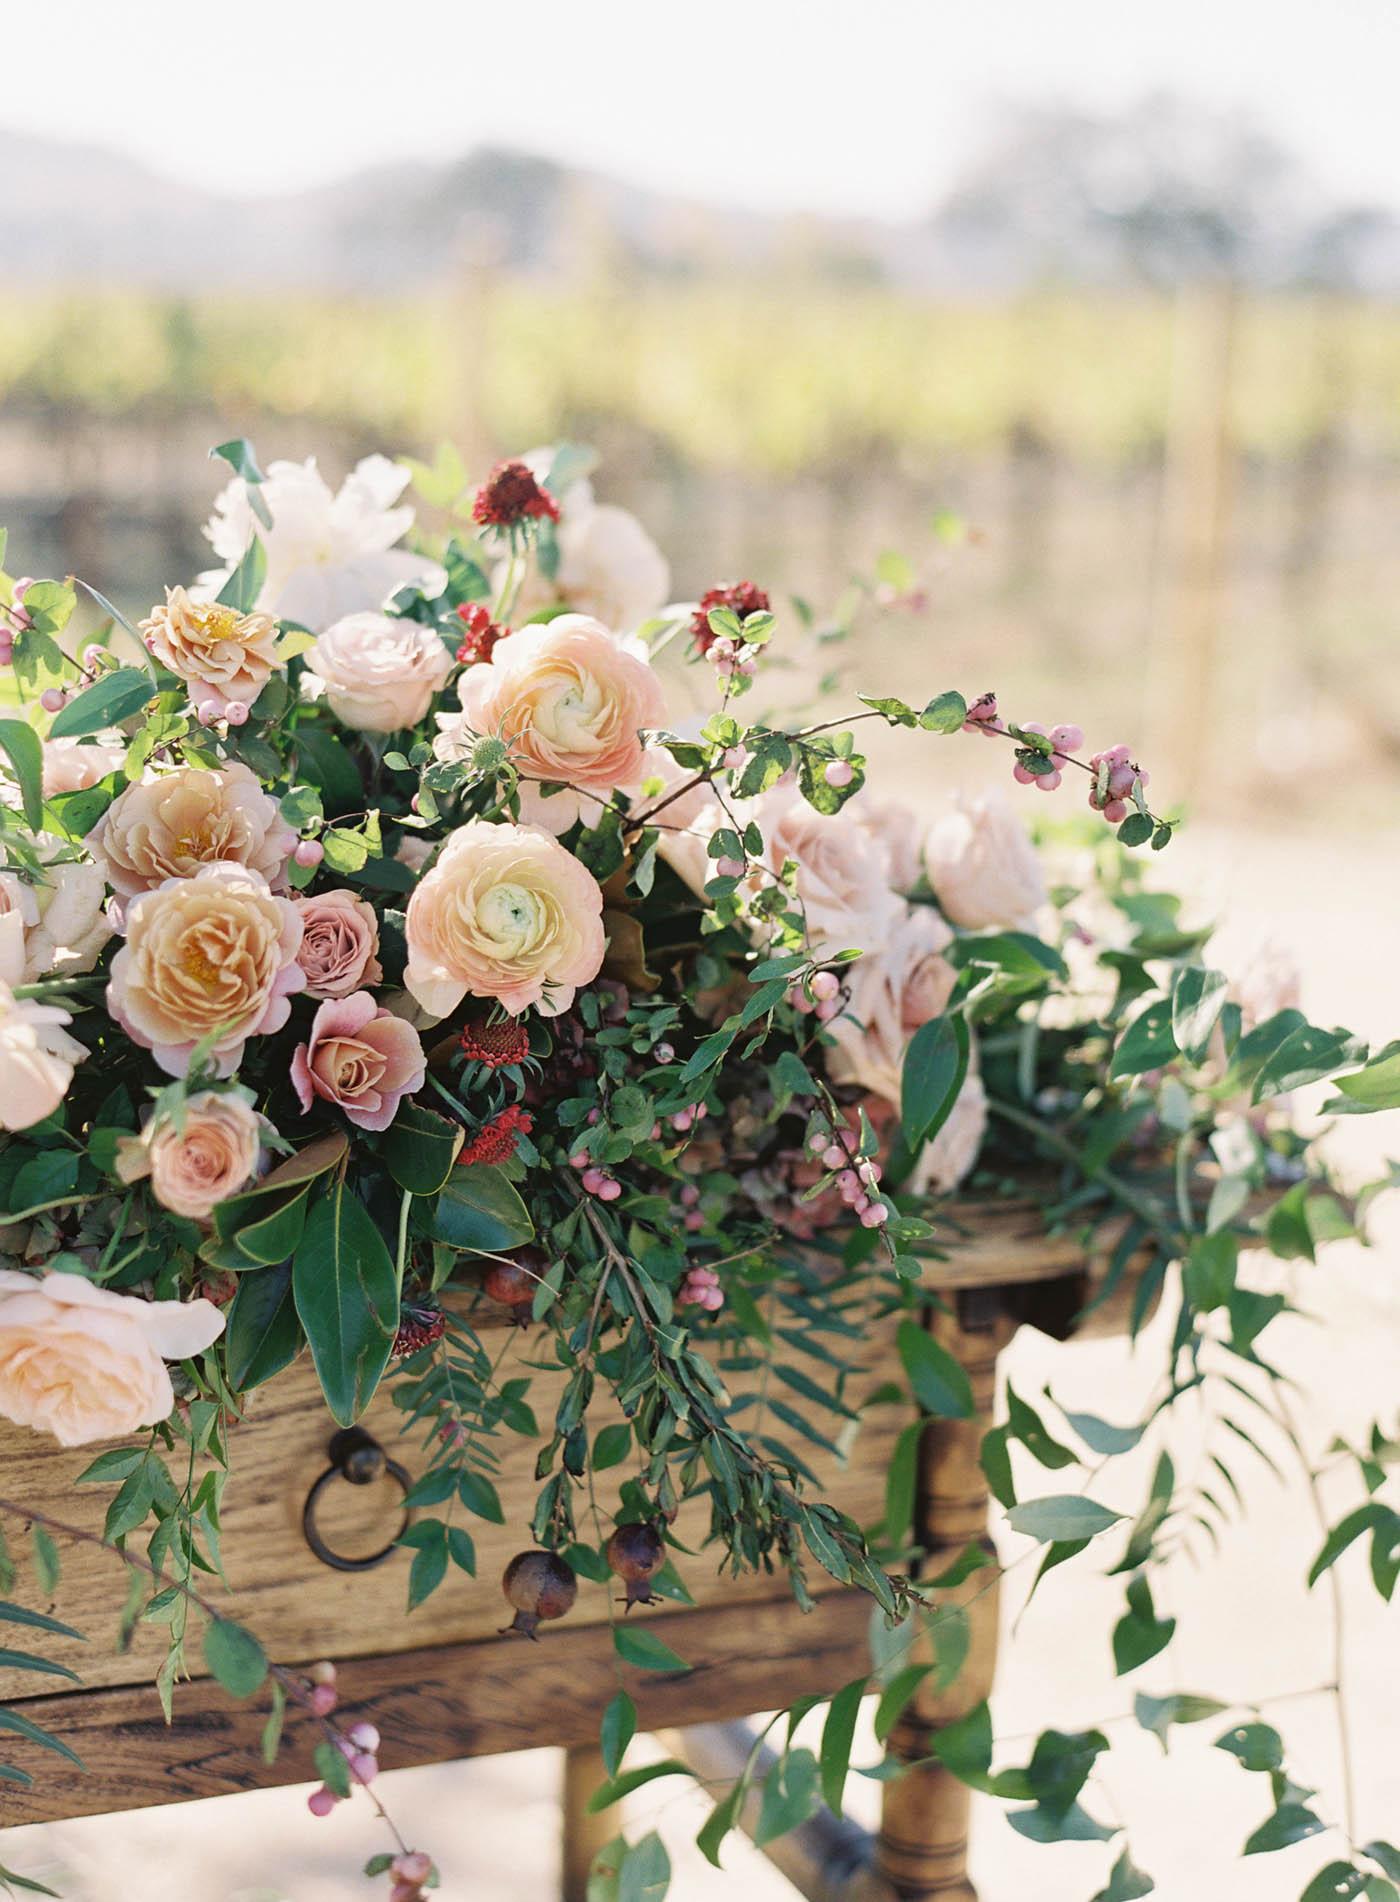 sunstone-villa-wedding-15-Jen_Huang-RD-56-Jen_Huang-009589-R1-008.jpg